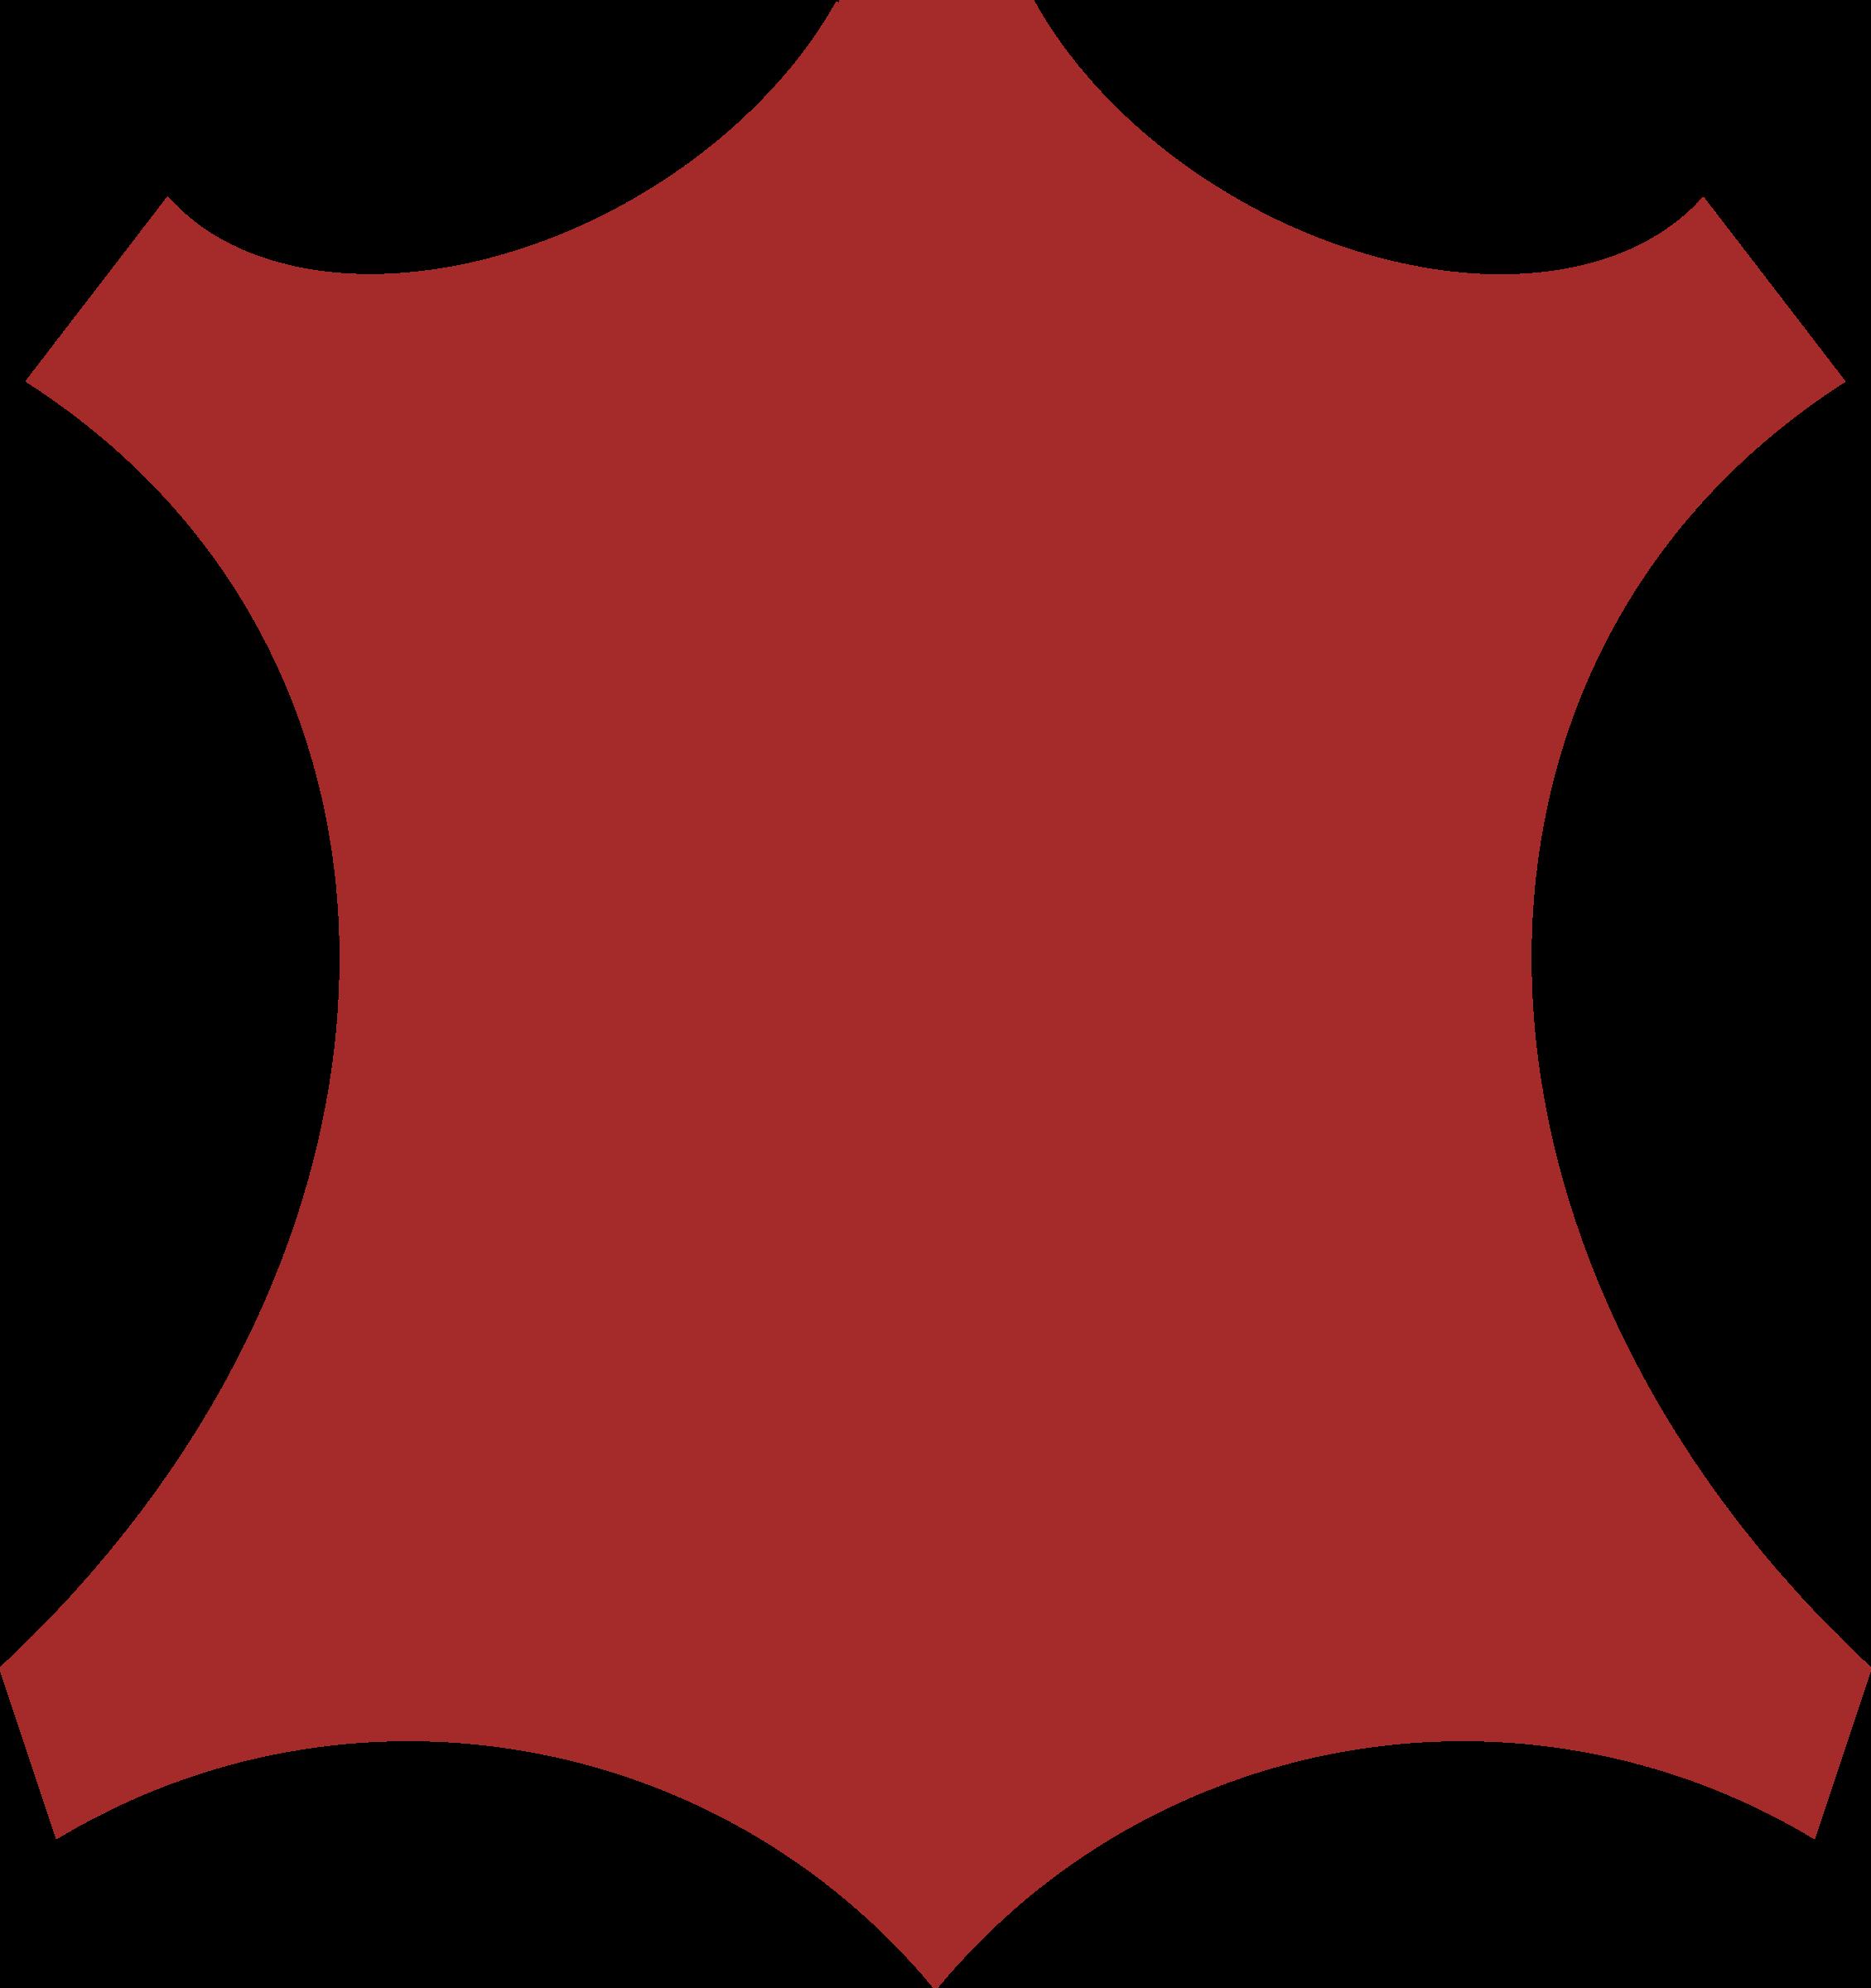 Leather logo clipart image transparent Gallery For > Leather Hide Clipart   cowhide art   Leather repair ... image transparent